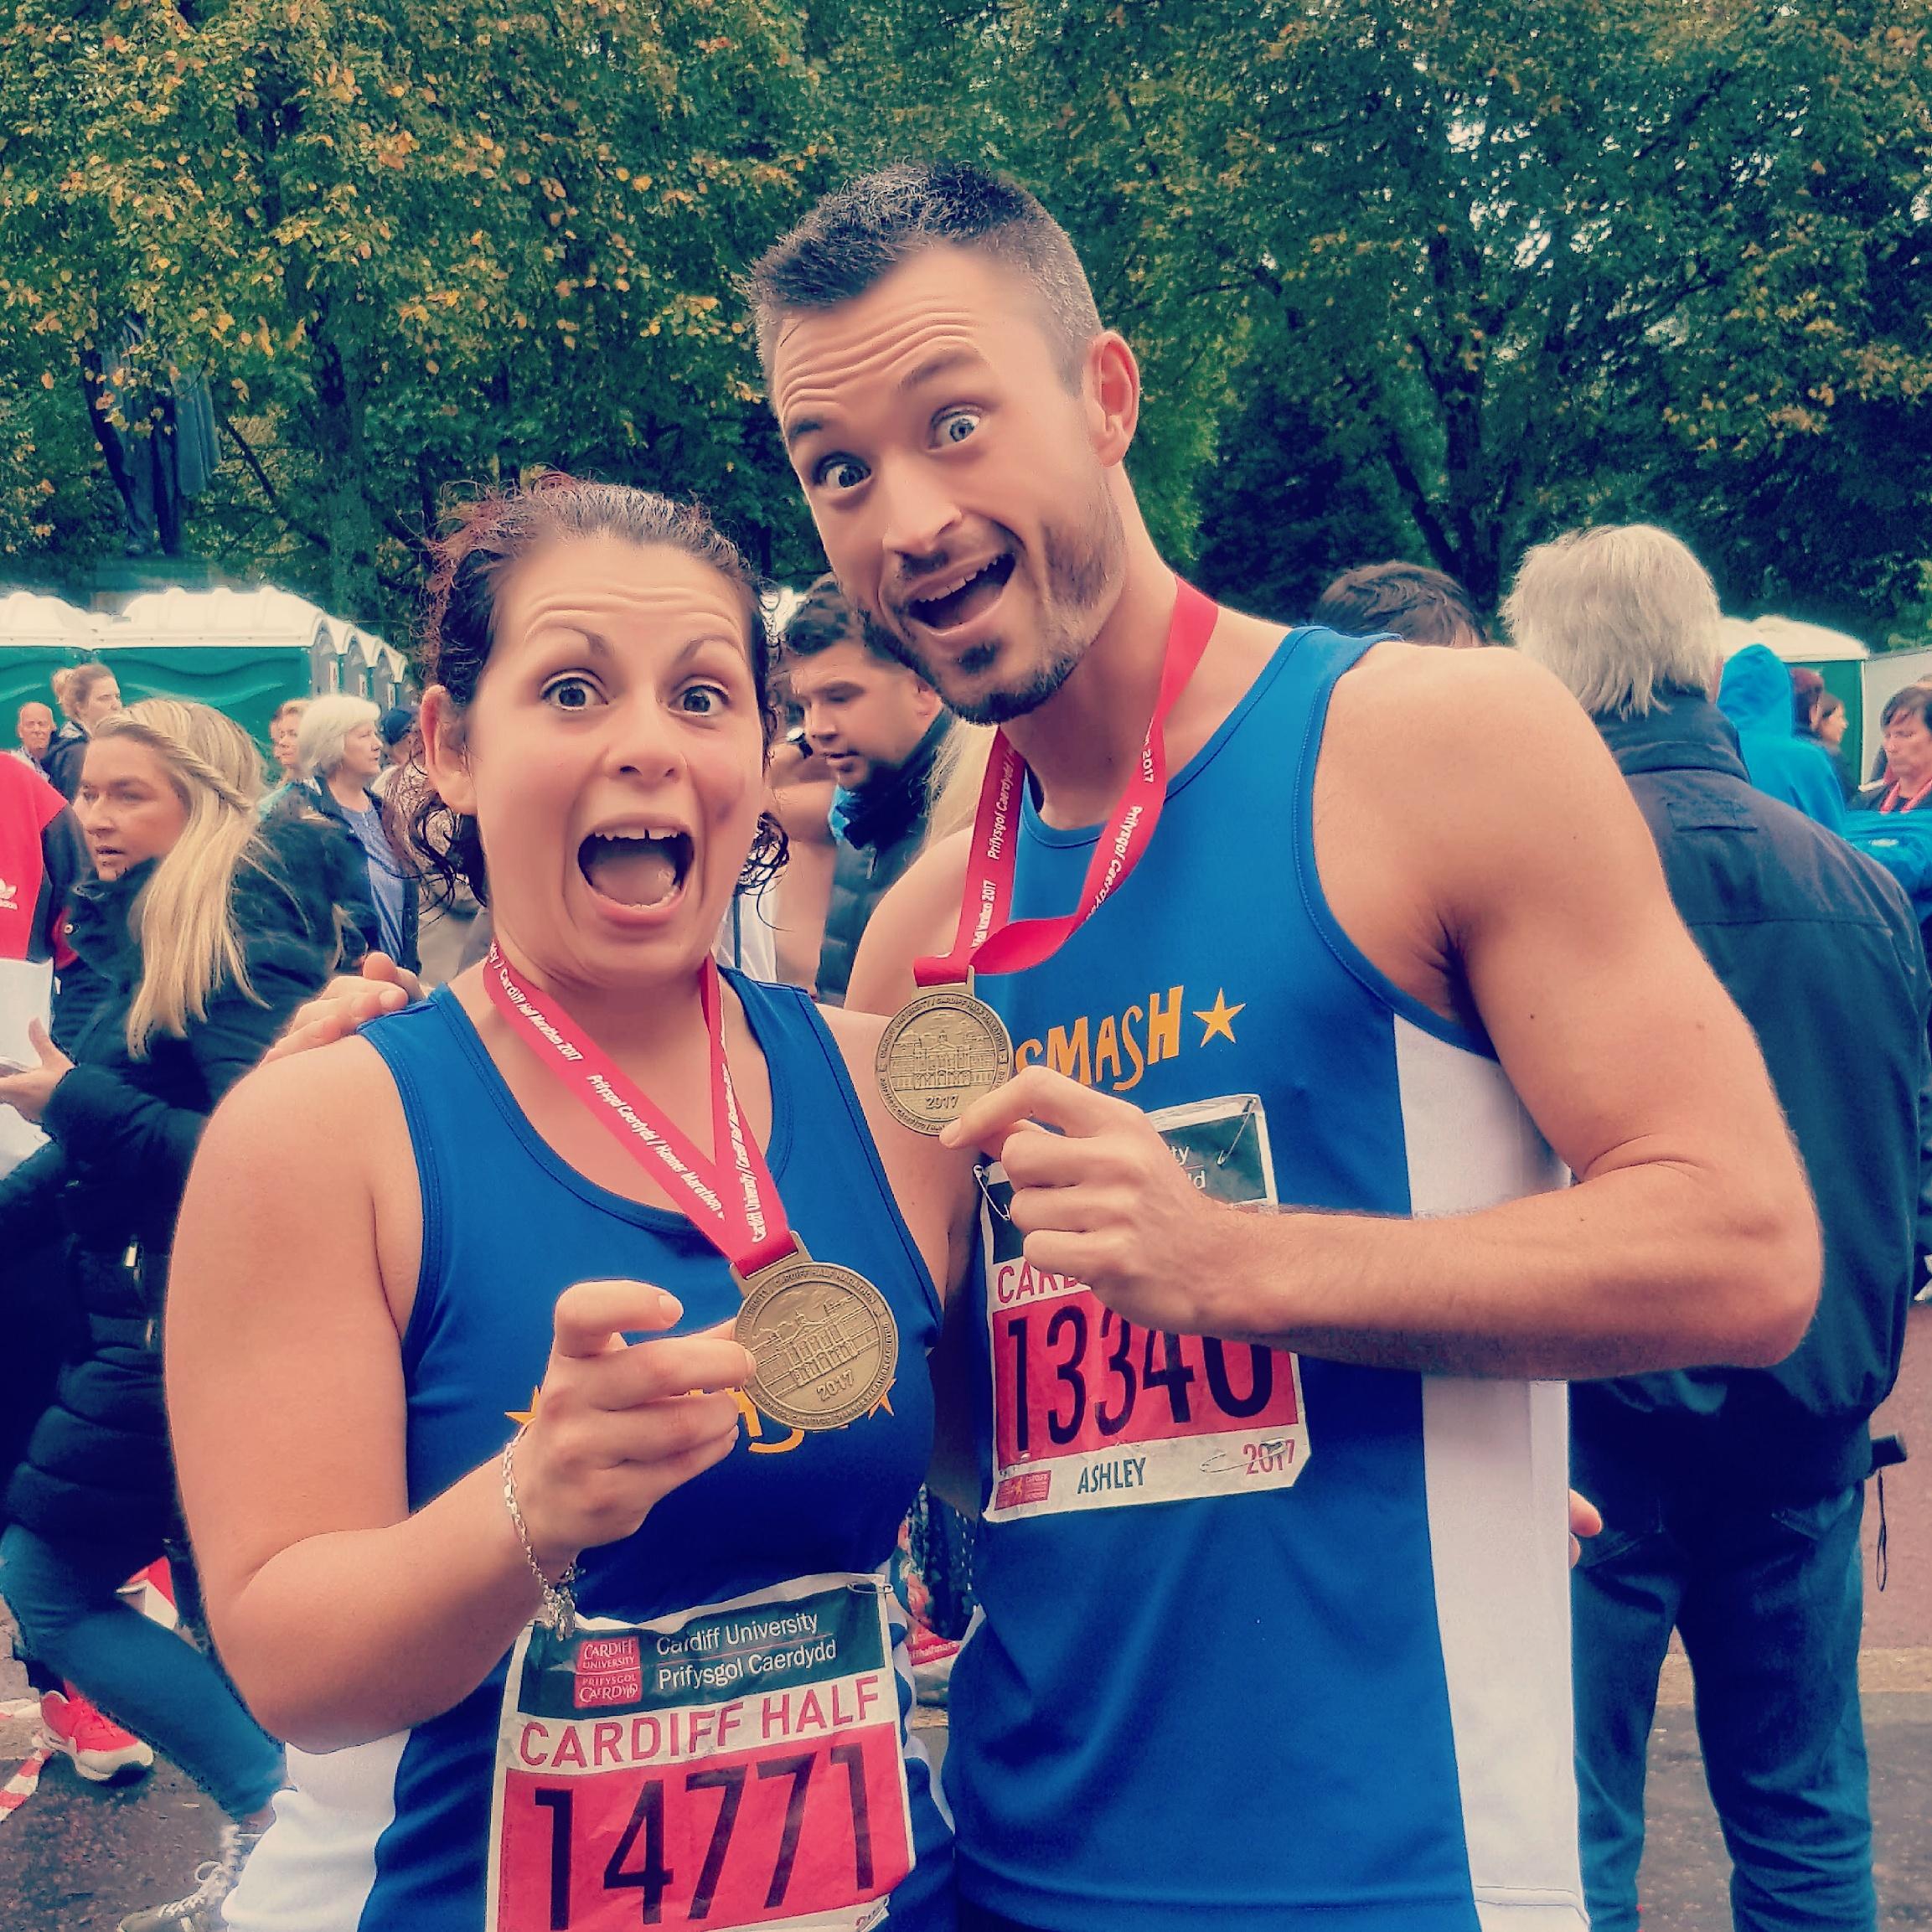 Cardiff Half Marathon.jpg